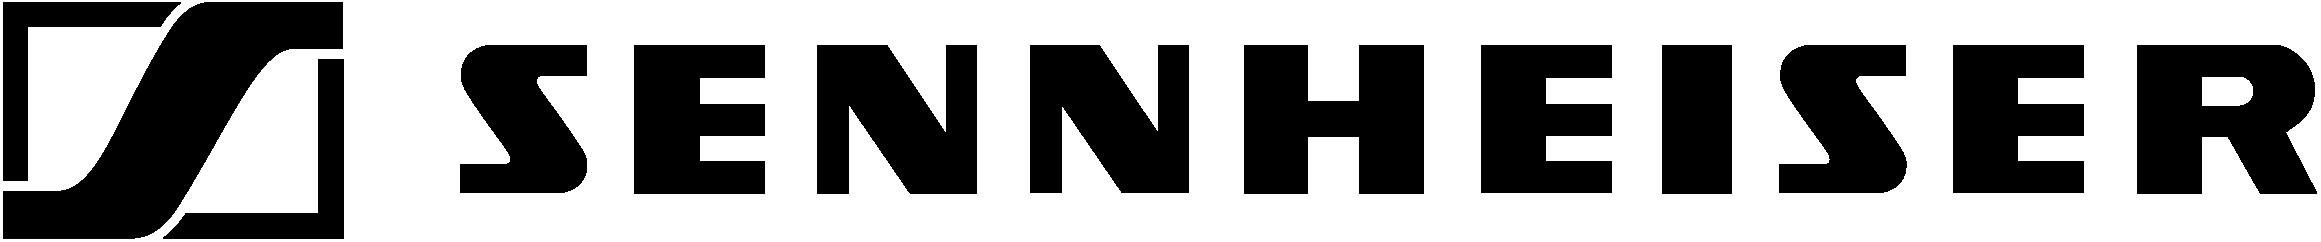 Sennheiser+logo+BLK+2.jpg